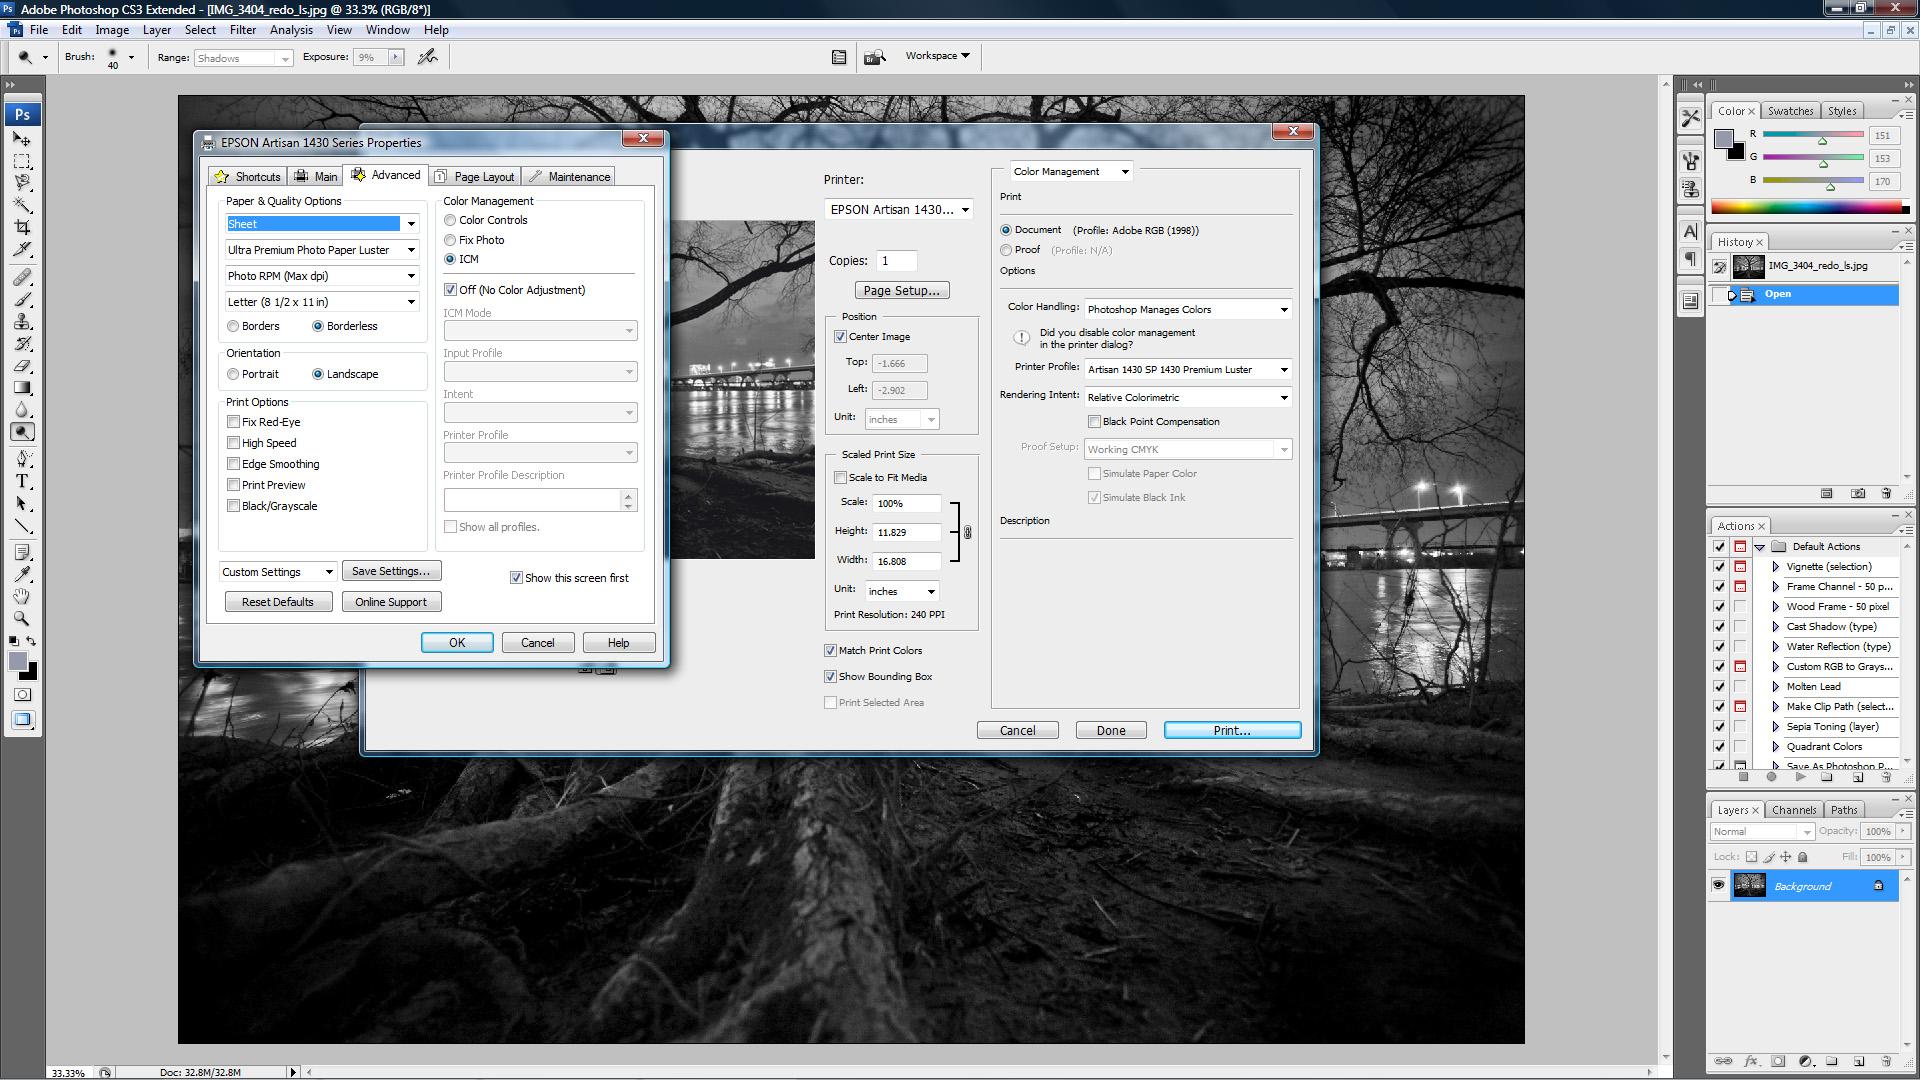 Epson Artisan 1430 Prints Too Dark - Help!: Printers and